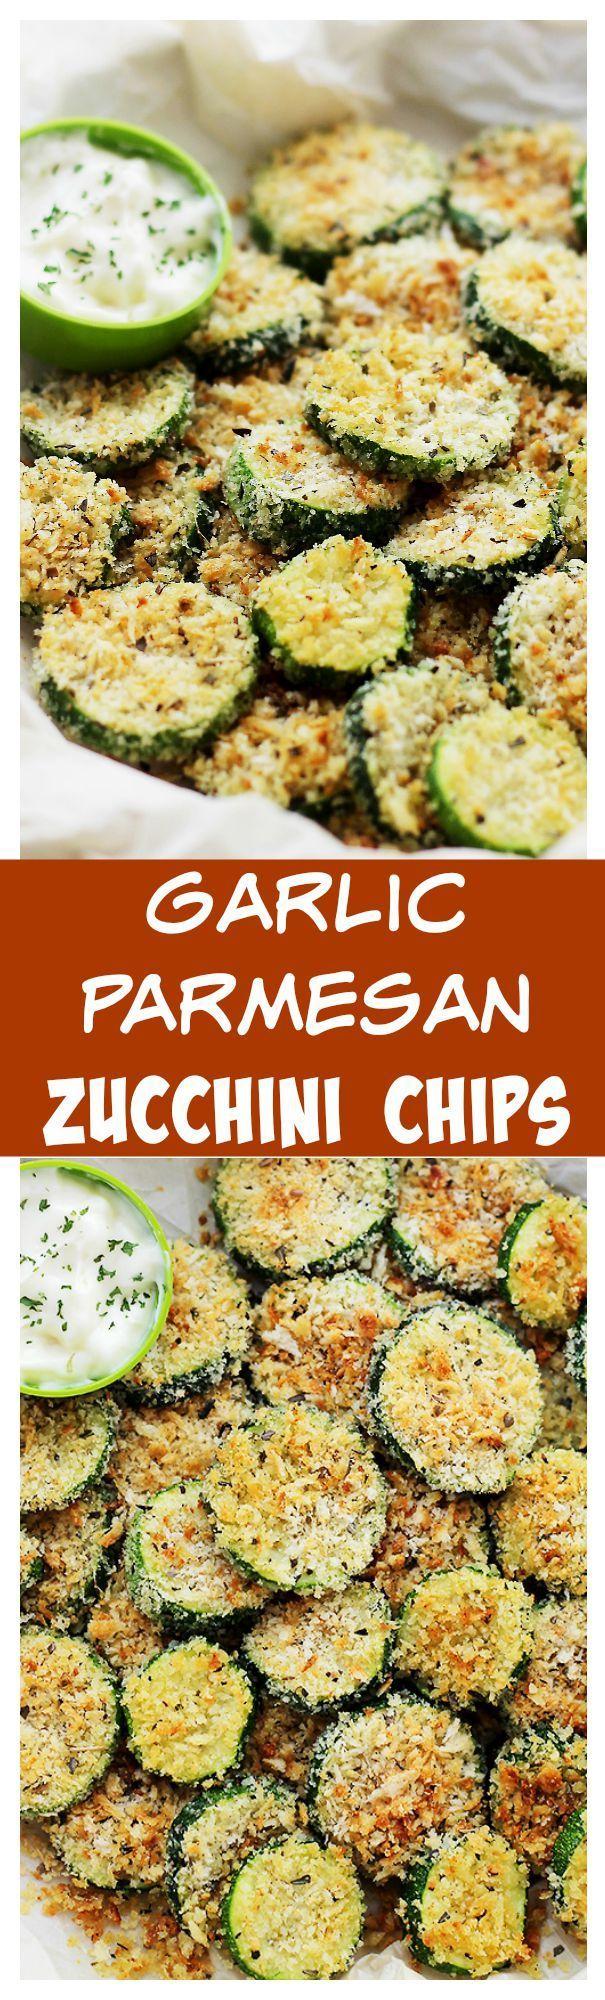 recipe: garlic parmesan zucchini fries [27]